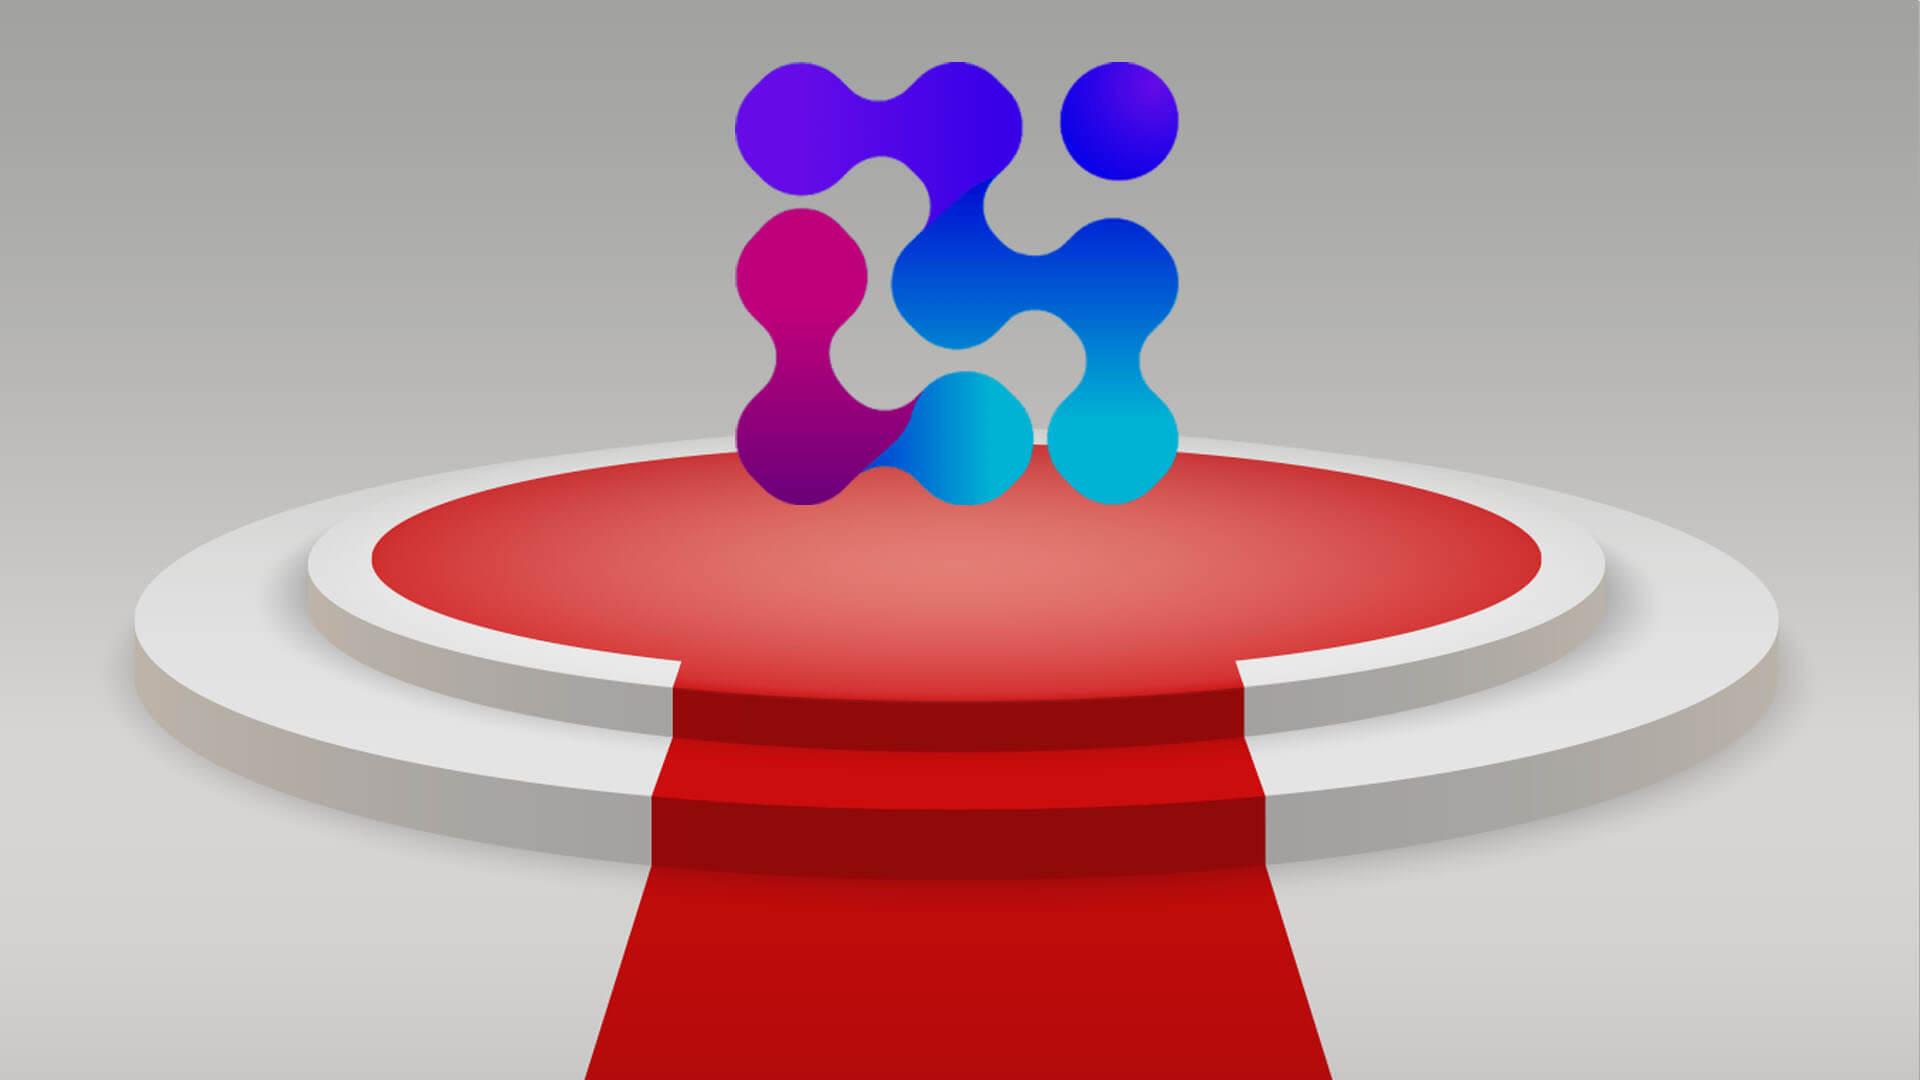 Clutch Recognizes MIU Creative Agency as a Top B2B Company